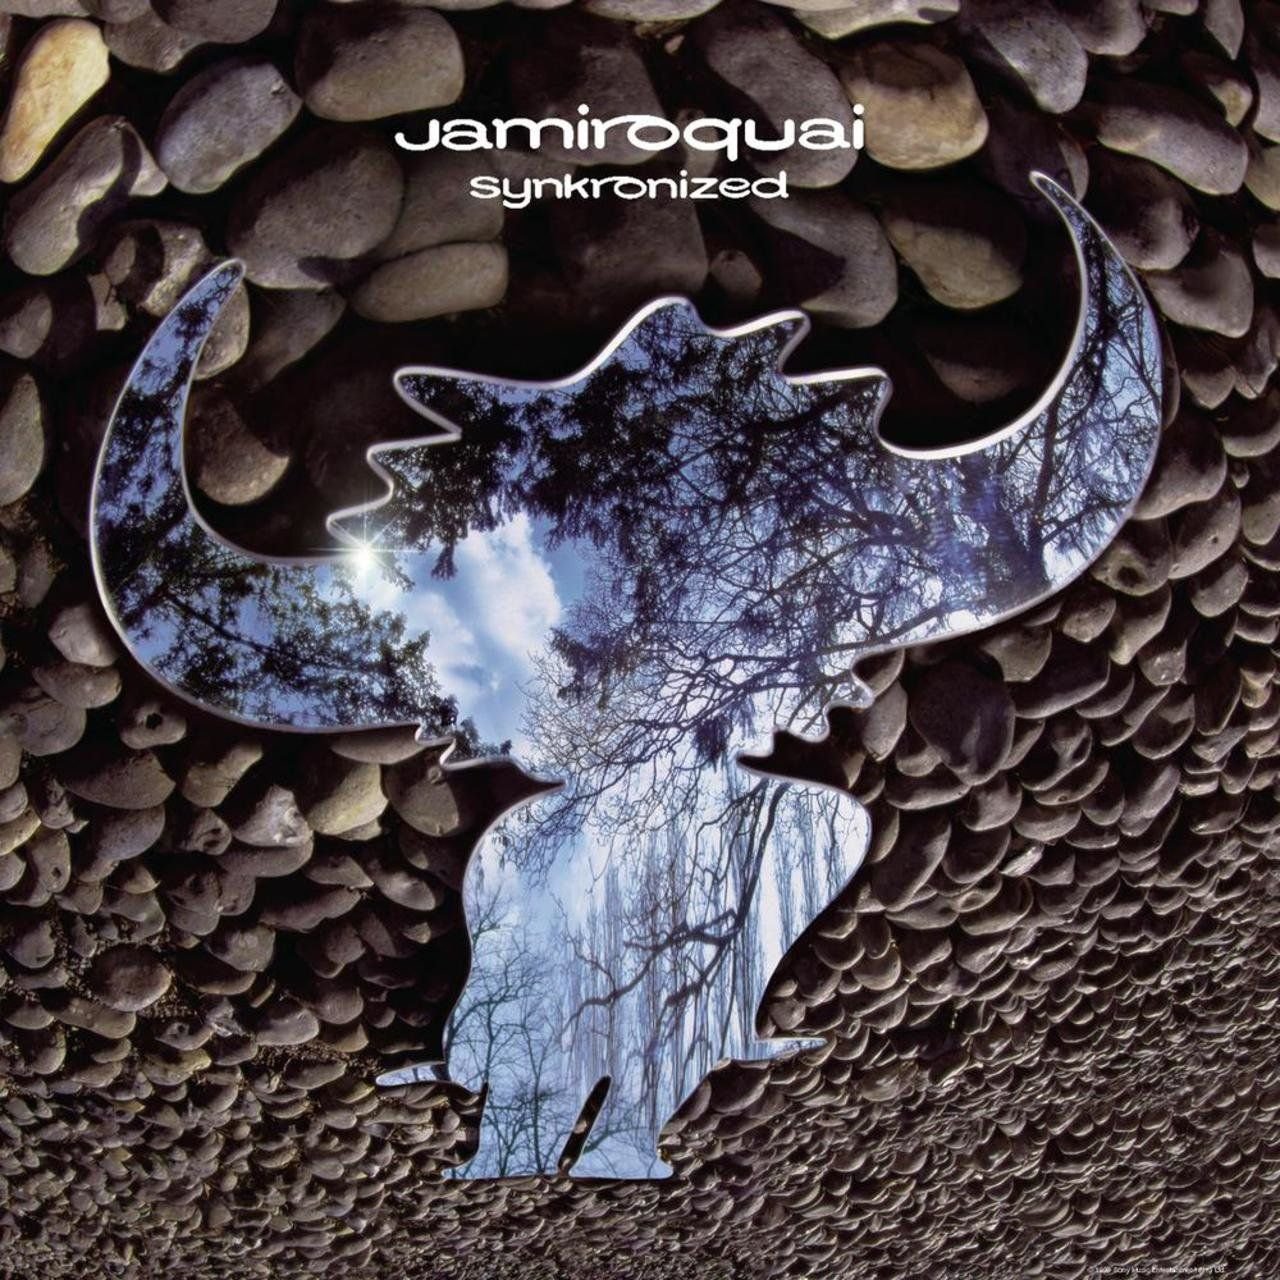 Jamiroquai Synkronized Vinyl Music Lp Vinyl Music History